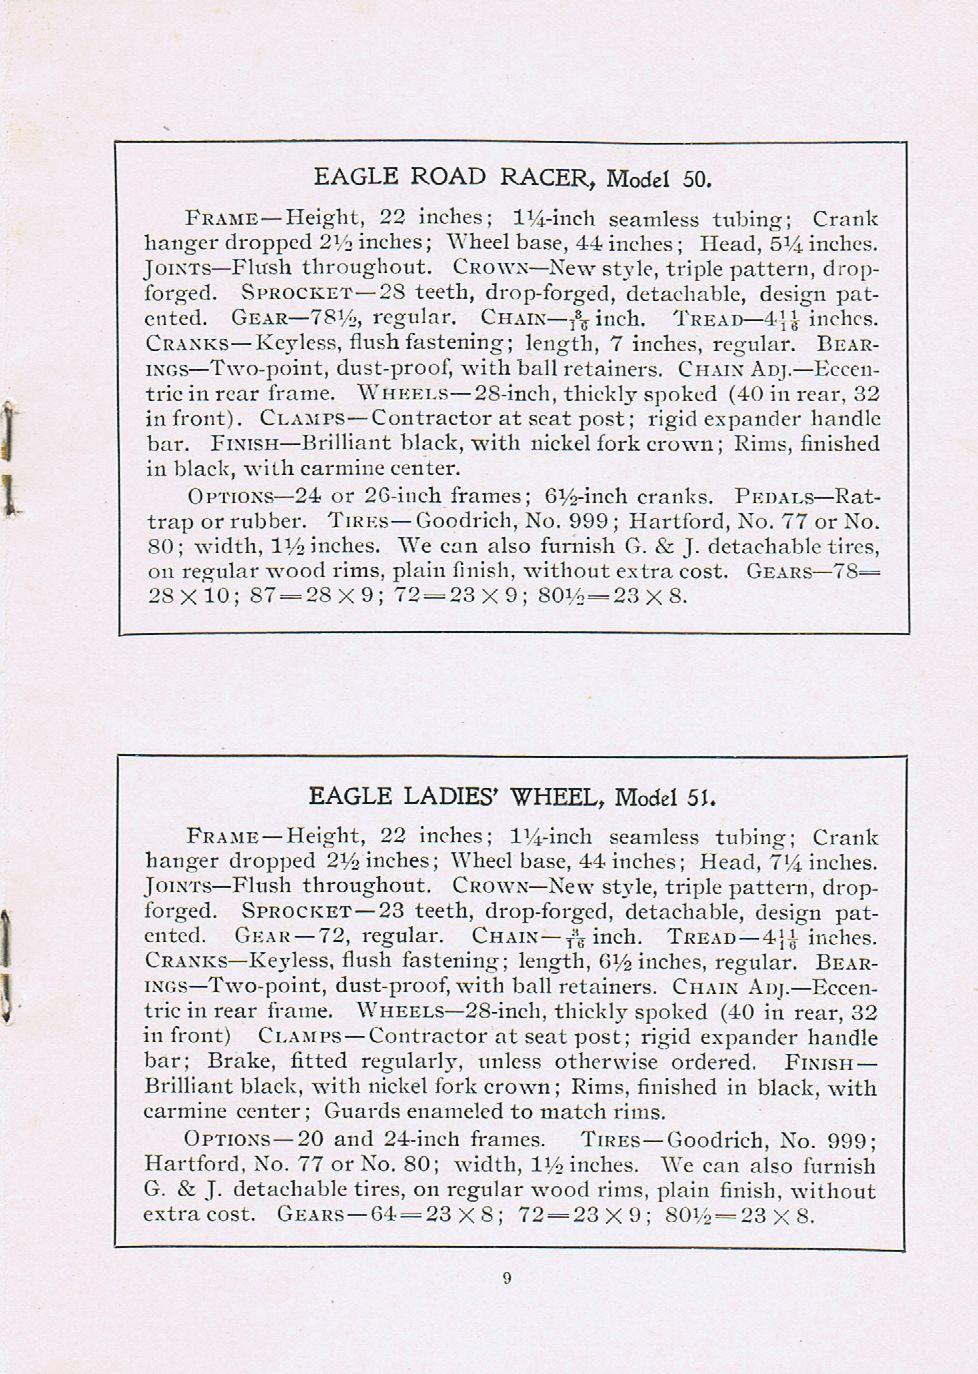 eagle-189910-jpg.jpg